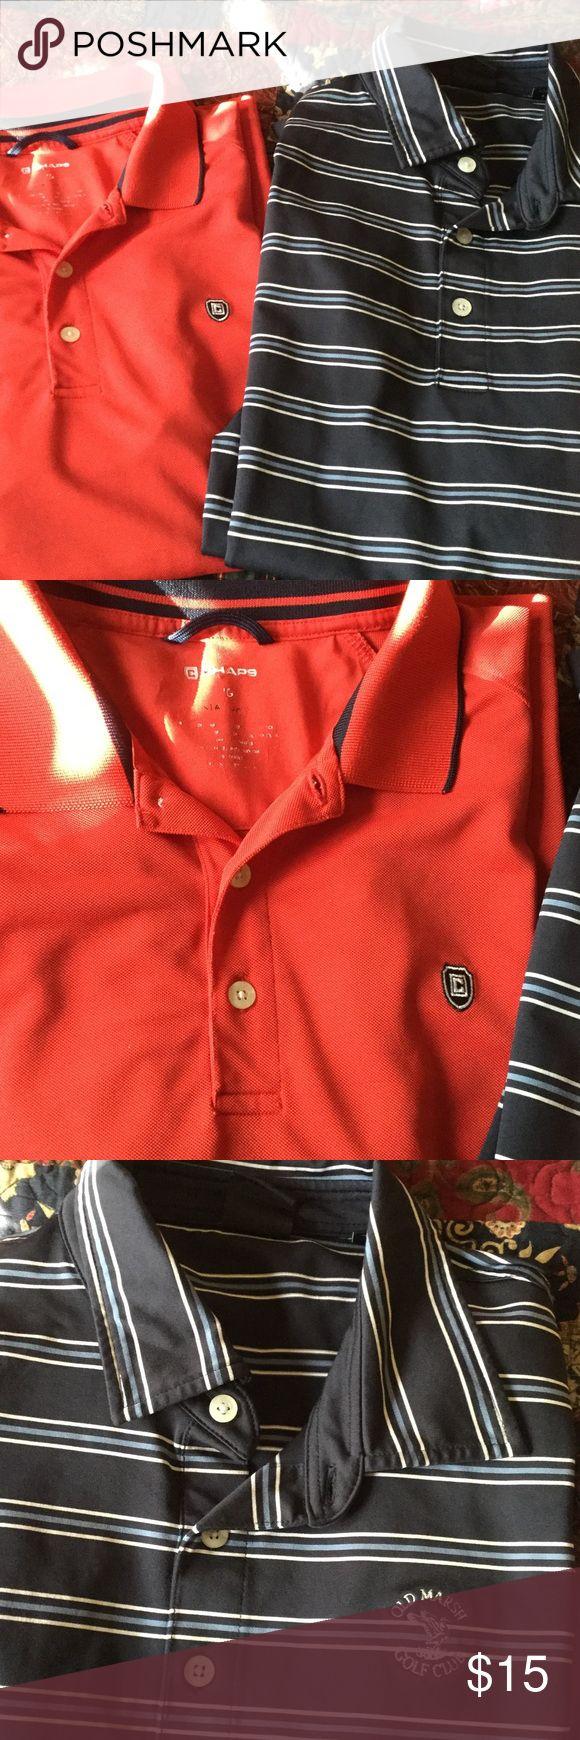 Men's golf shirt bundle (2) Men's bundle of two golf shirts Shirts Polos